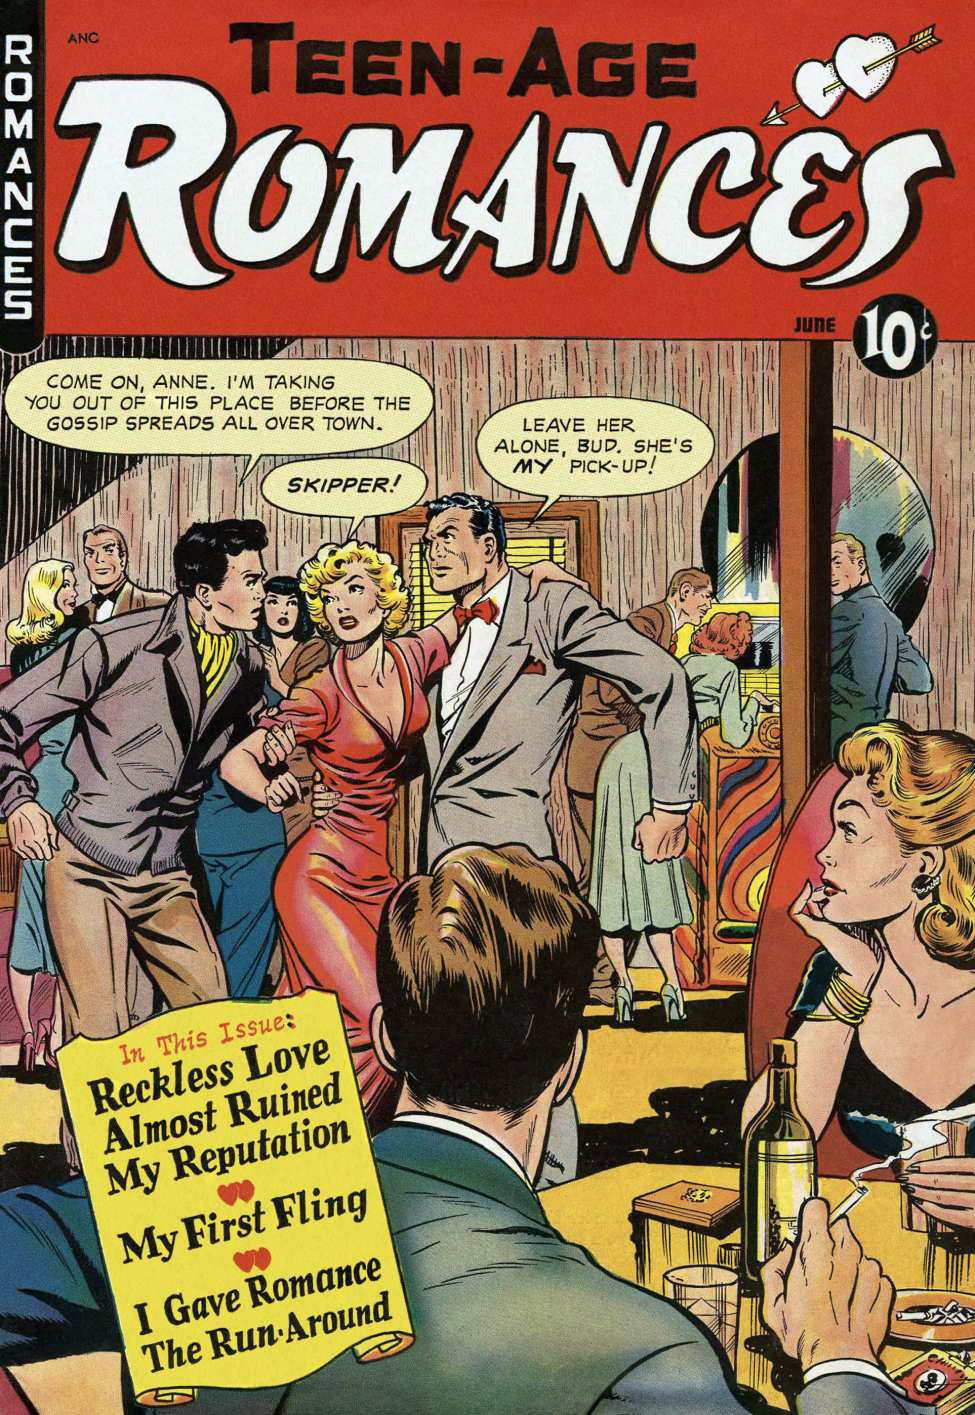 Teen Age Romances #10, St. John